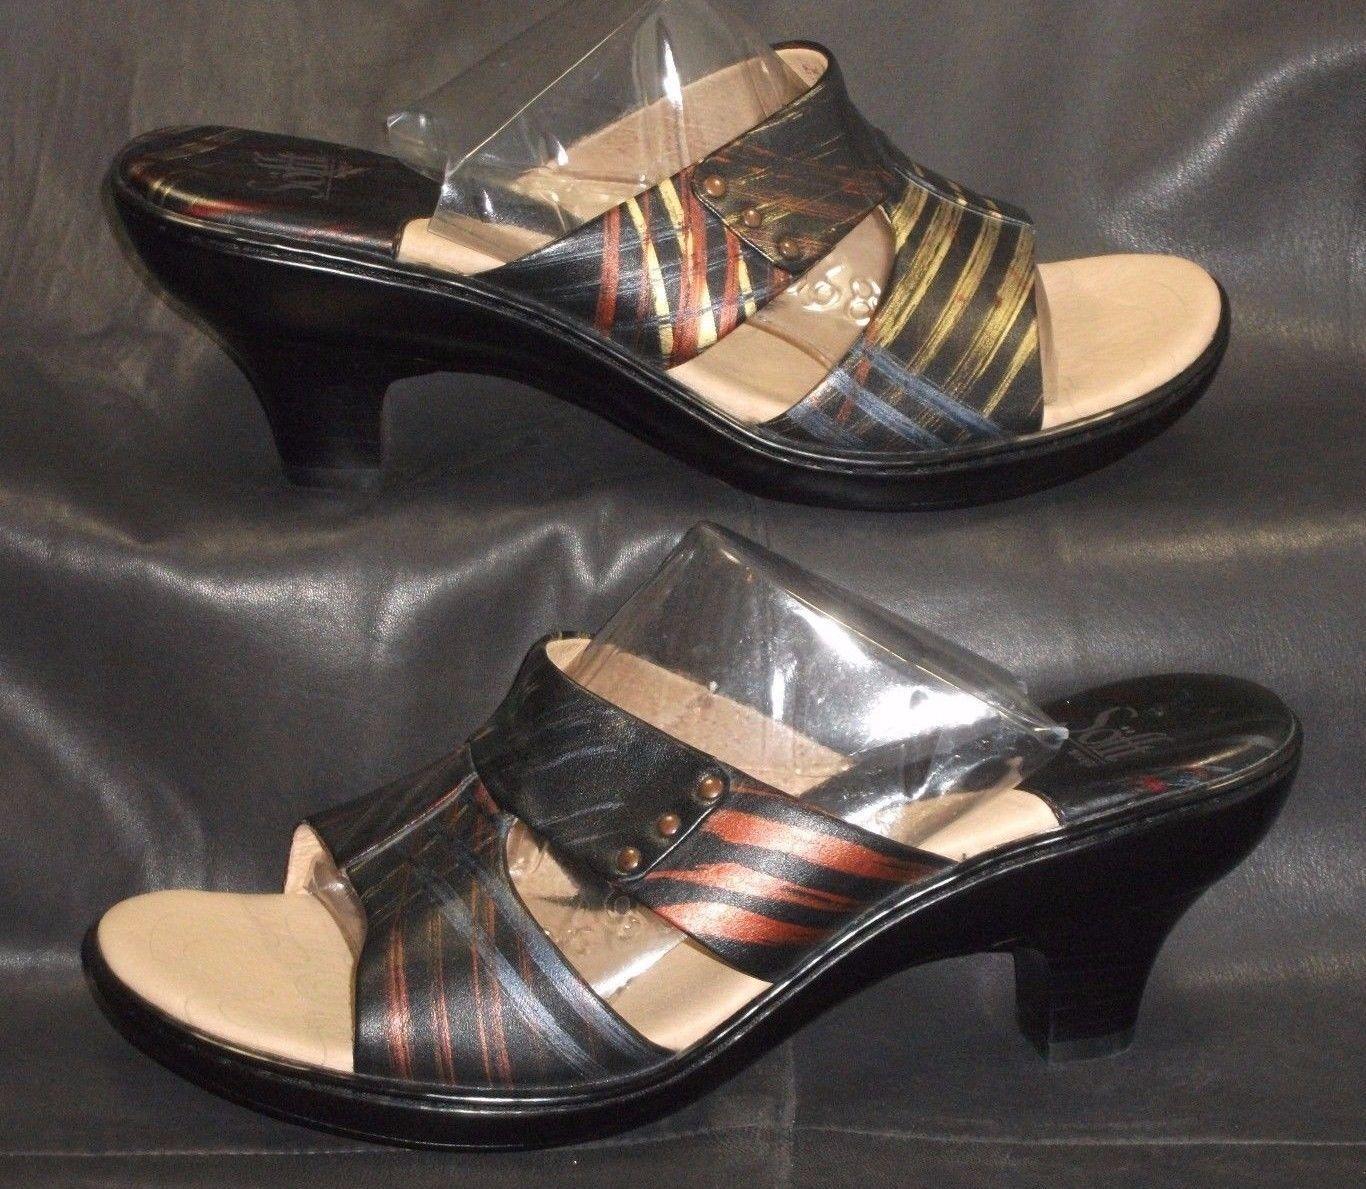 Sofft multi-Color leather open toe mules sandals Women's shoes size 8 1/2 M